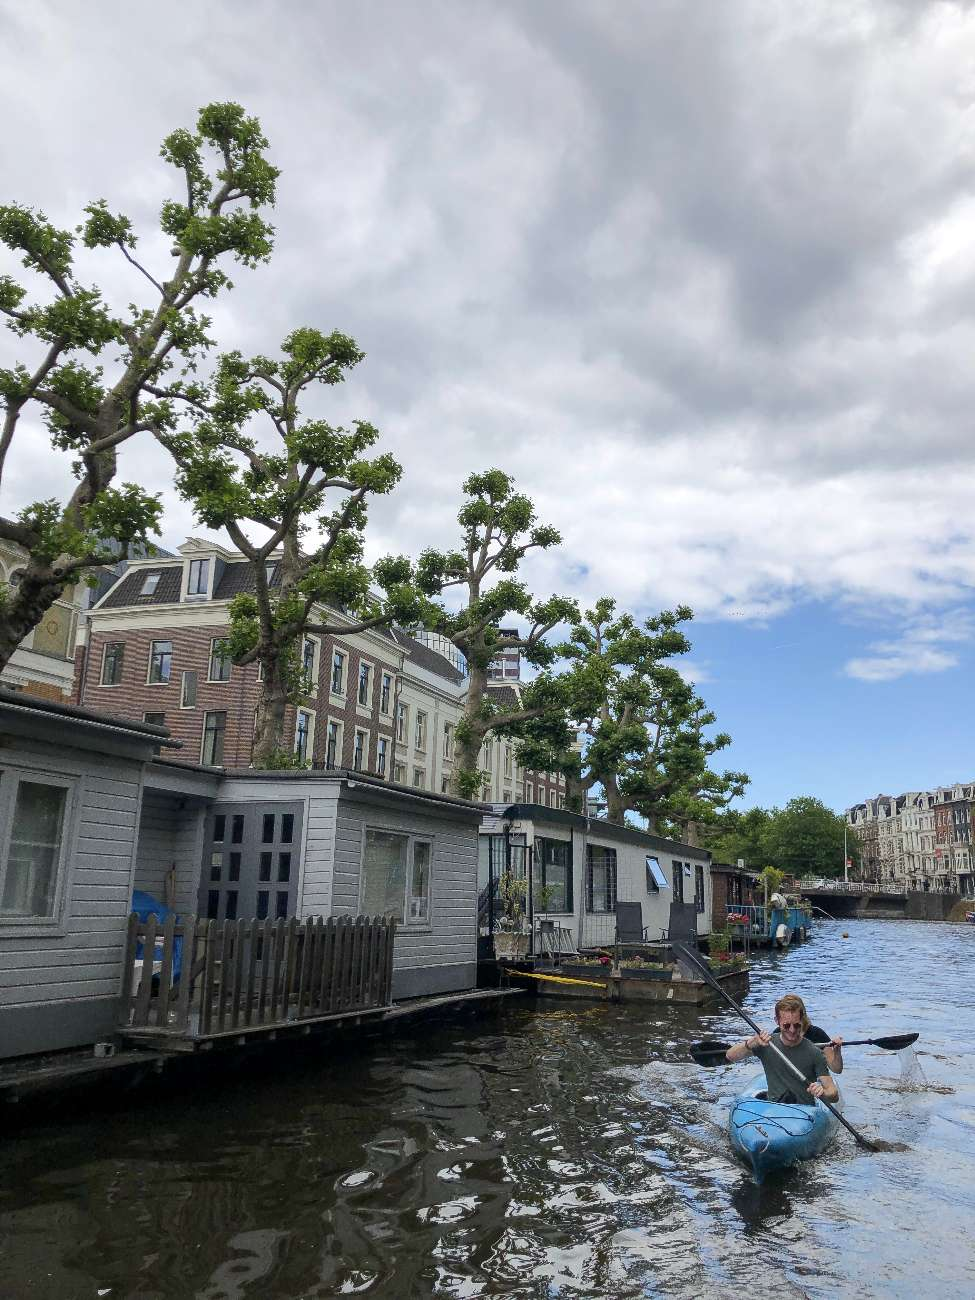 Kanutour auf den Amsterdamer Kanälen mit Hausbooten